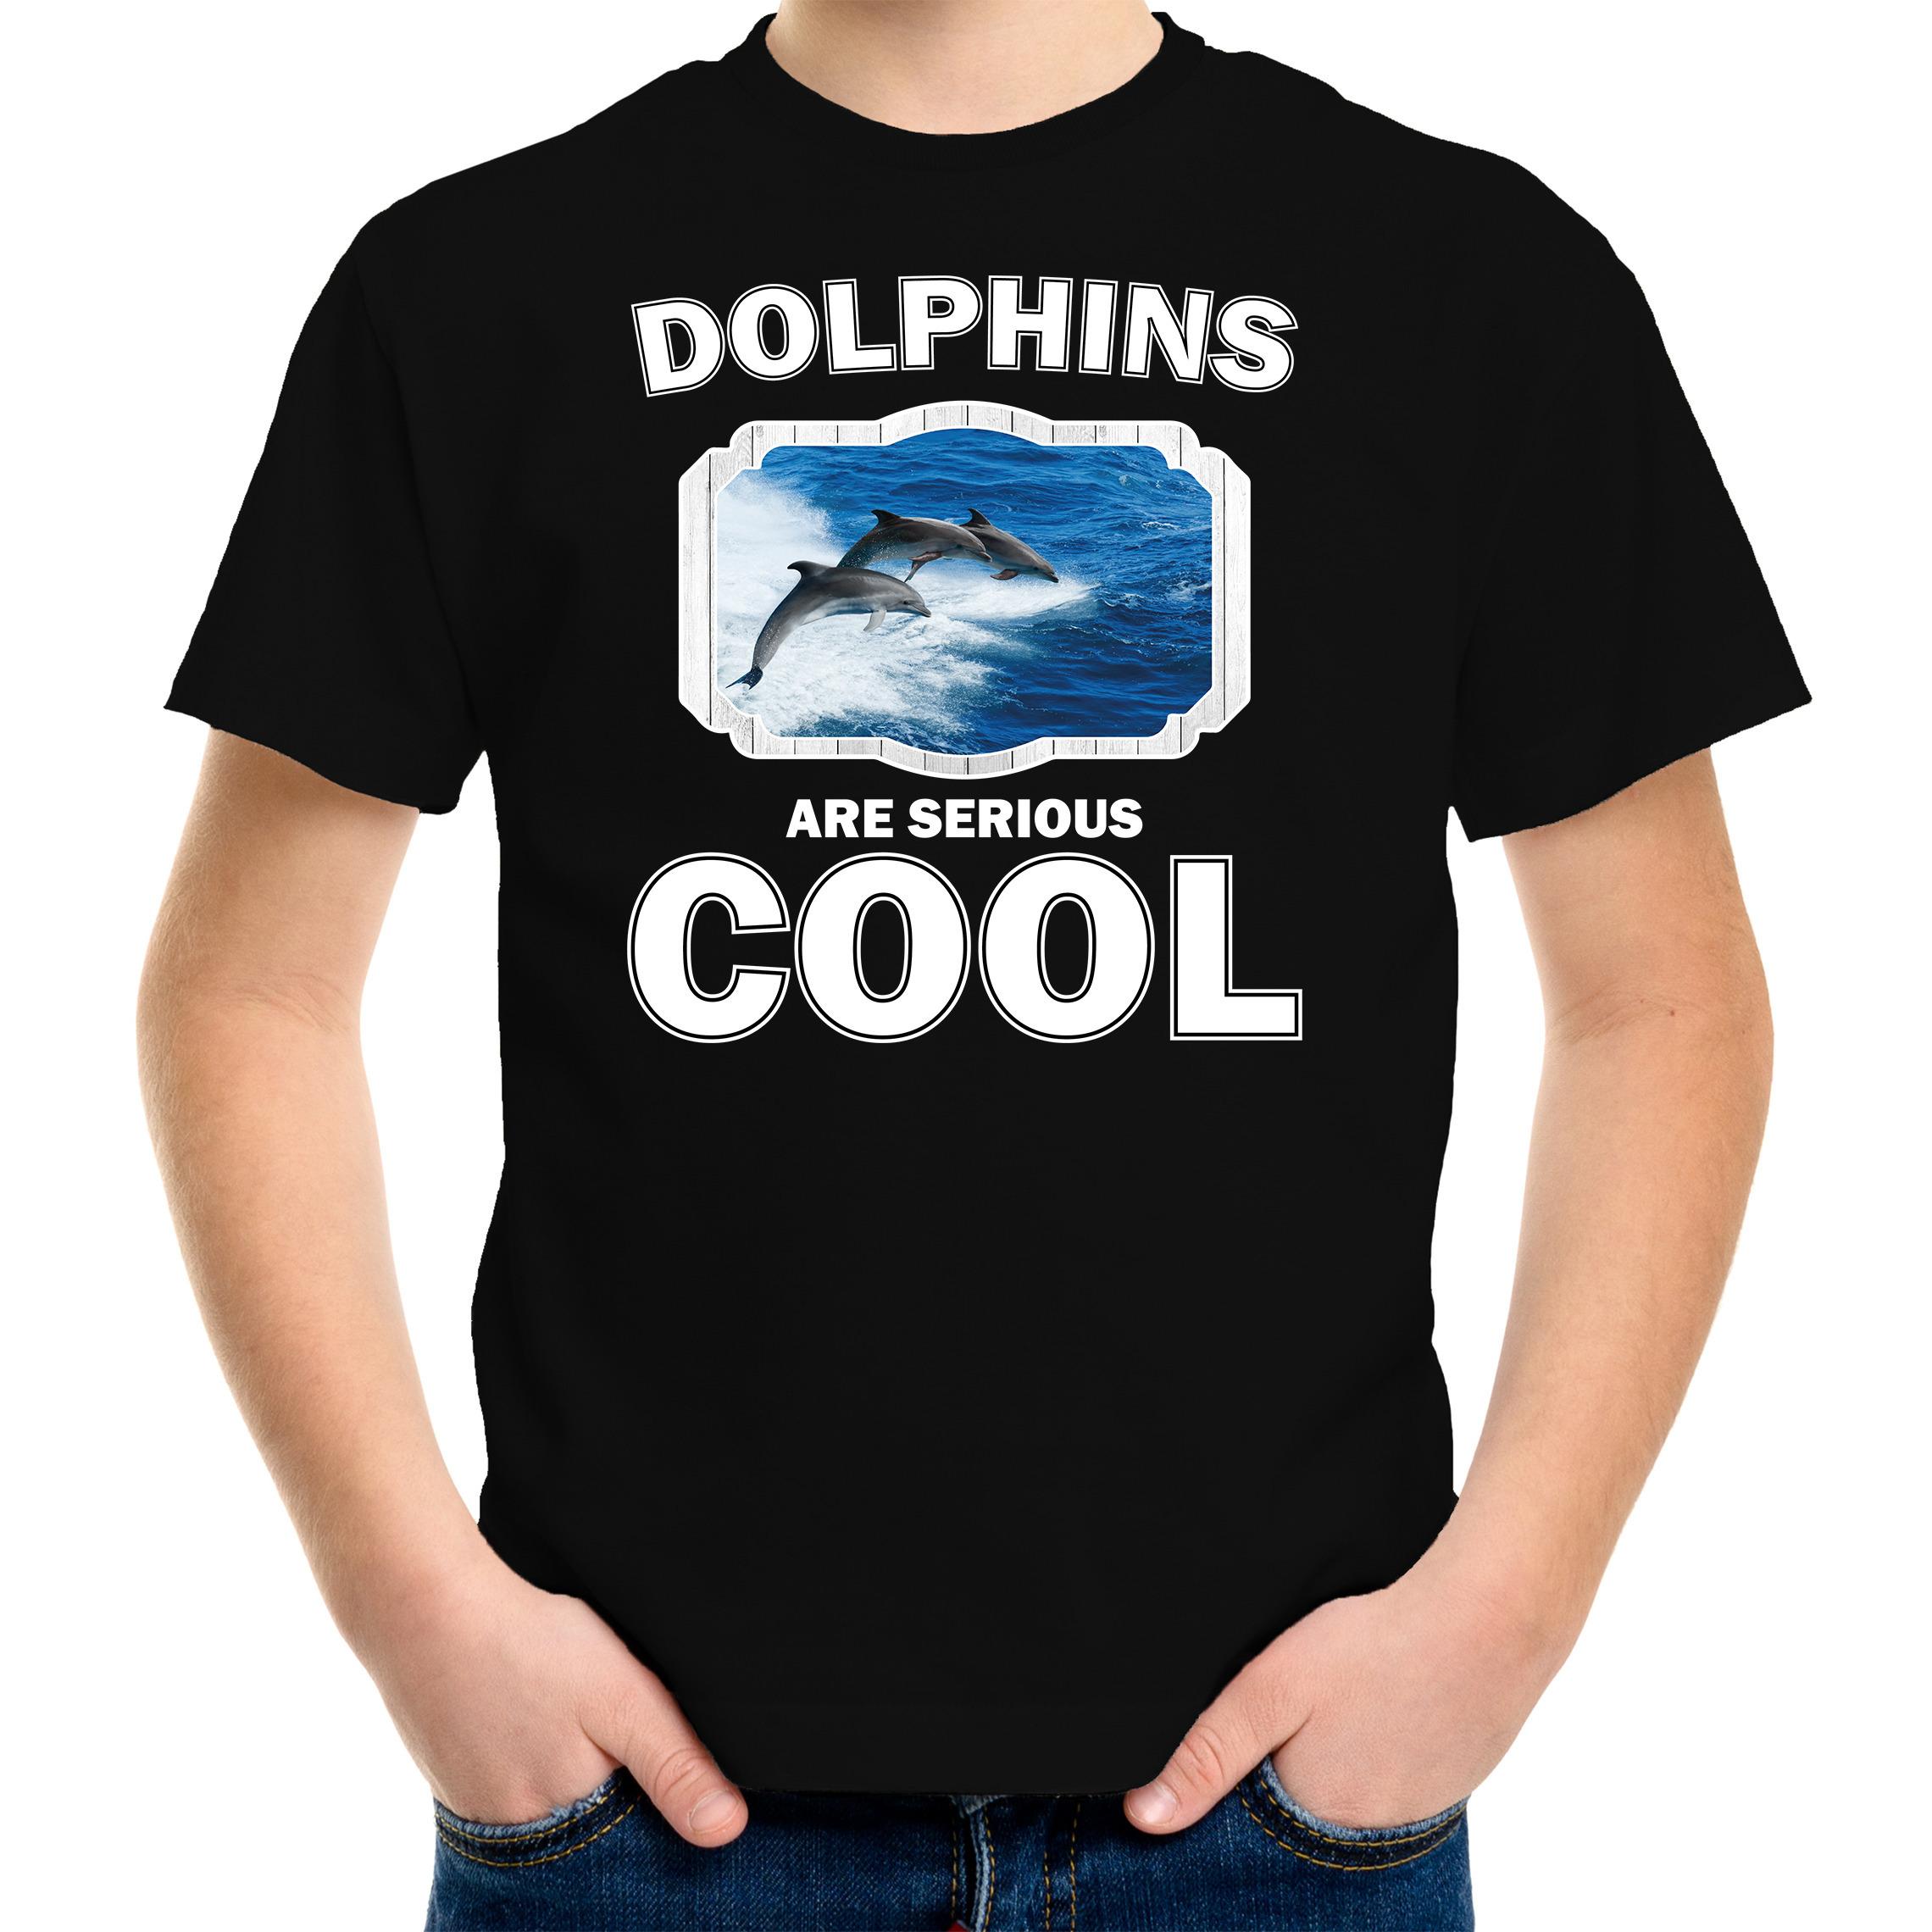 T-shirt dolphins are serious cool zwart kinderen - dolfijnen/ dolfijn groep shirt